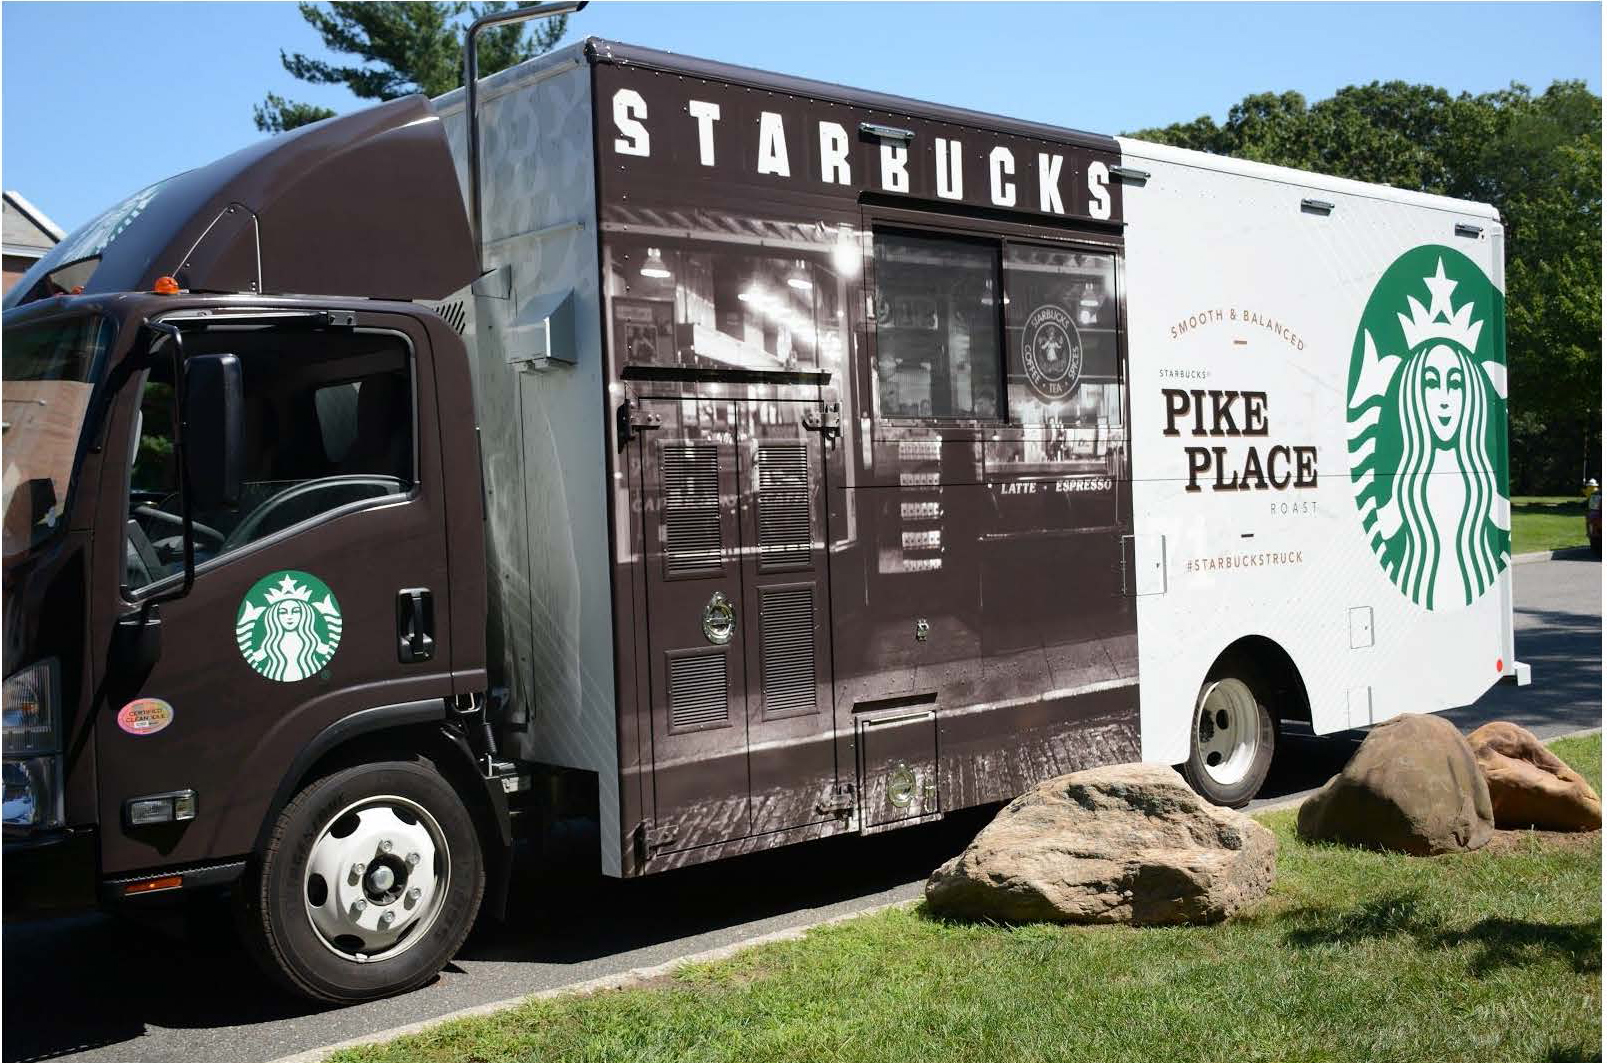 1 starbucks truck